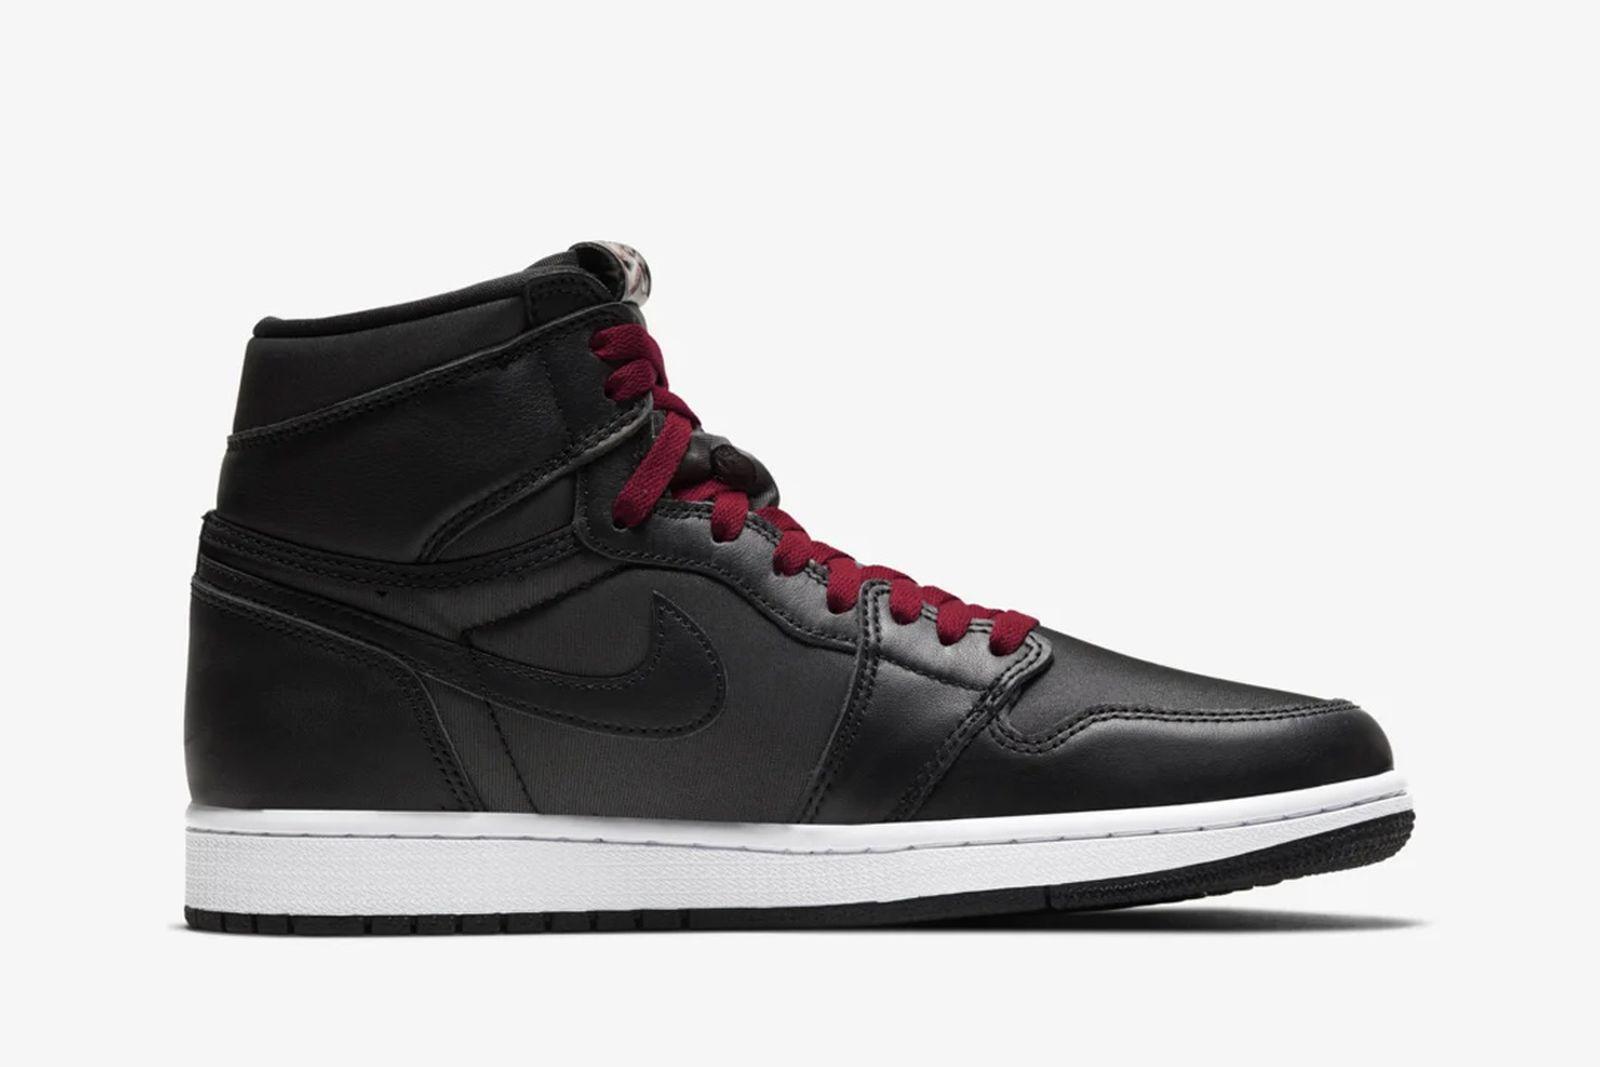 nike-air-jordan-1-neoprene-black-red-release-date-price-03